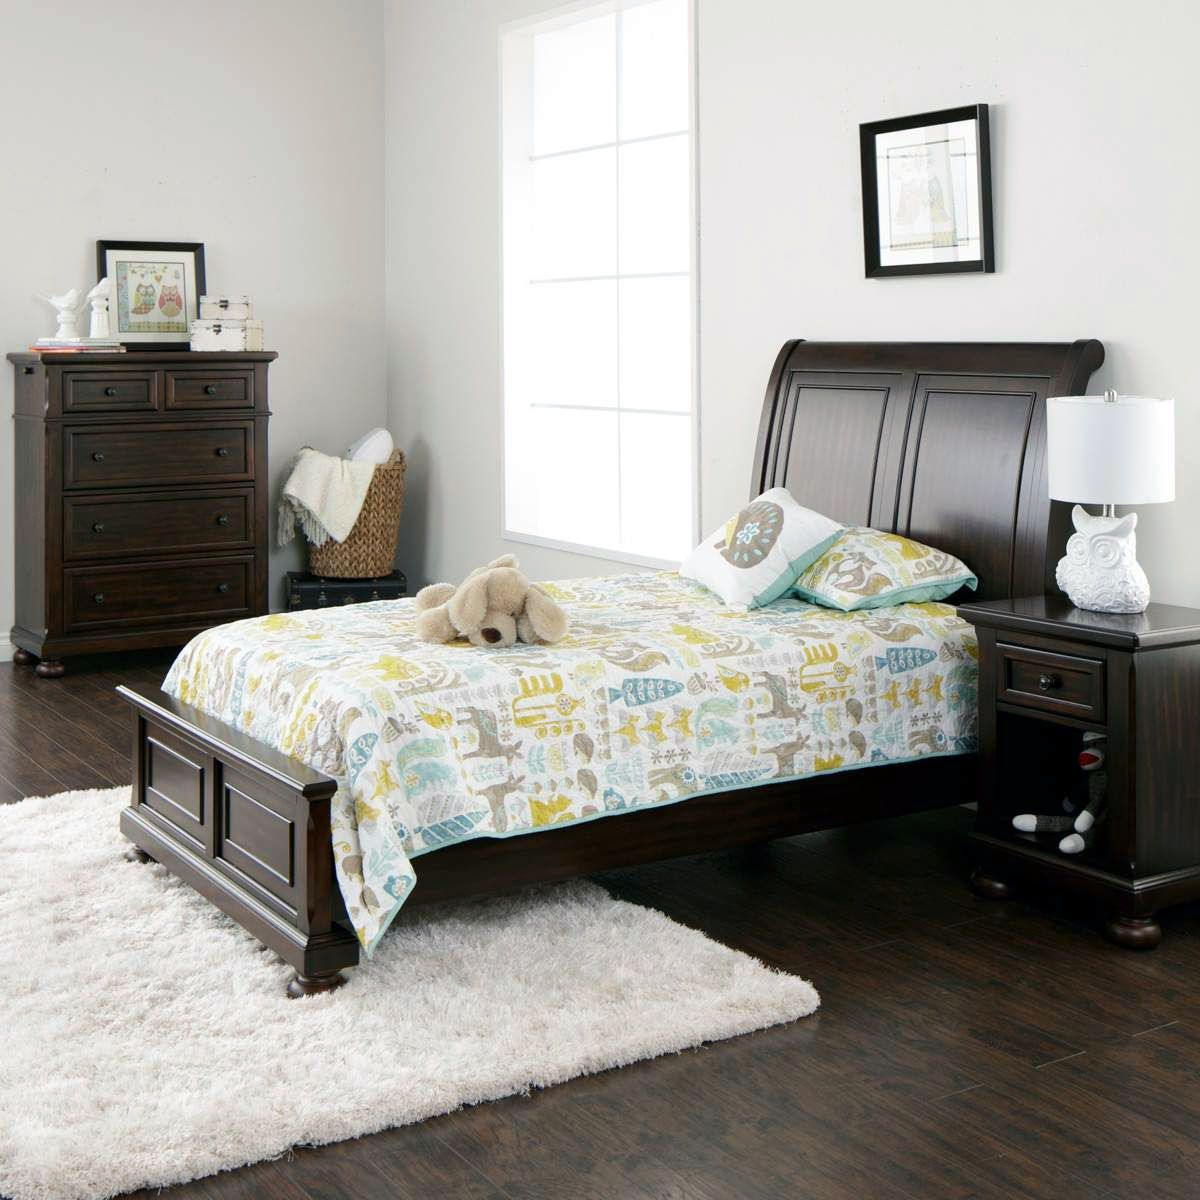 Girls bedroom ideas for every child  Girls bedroom sets, Kids